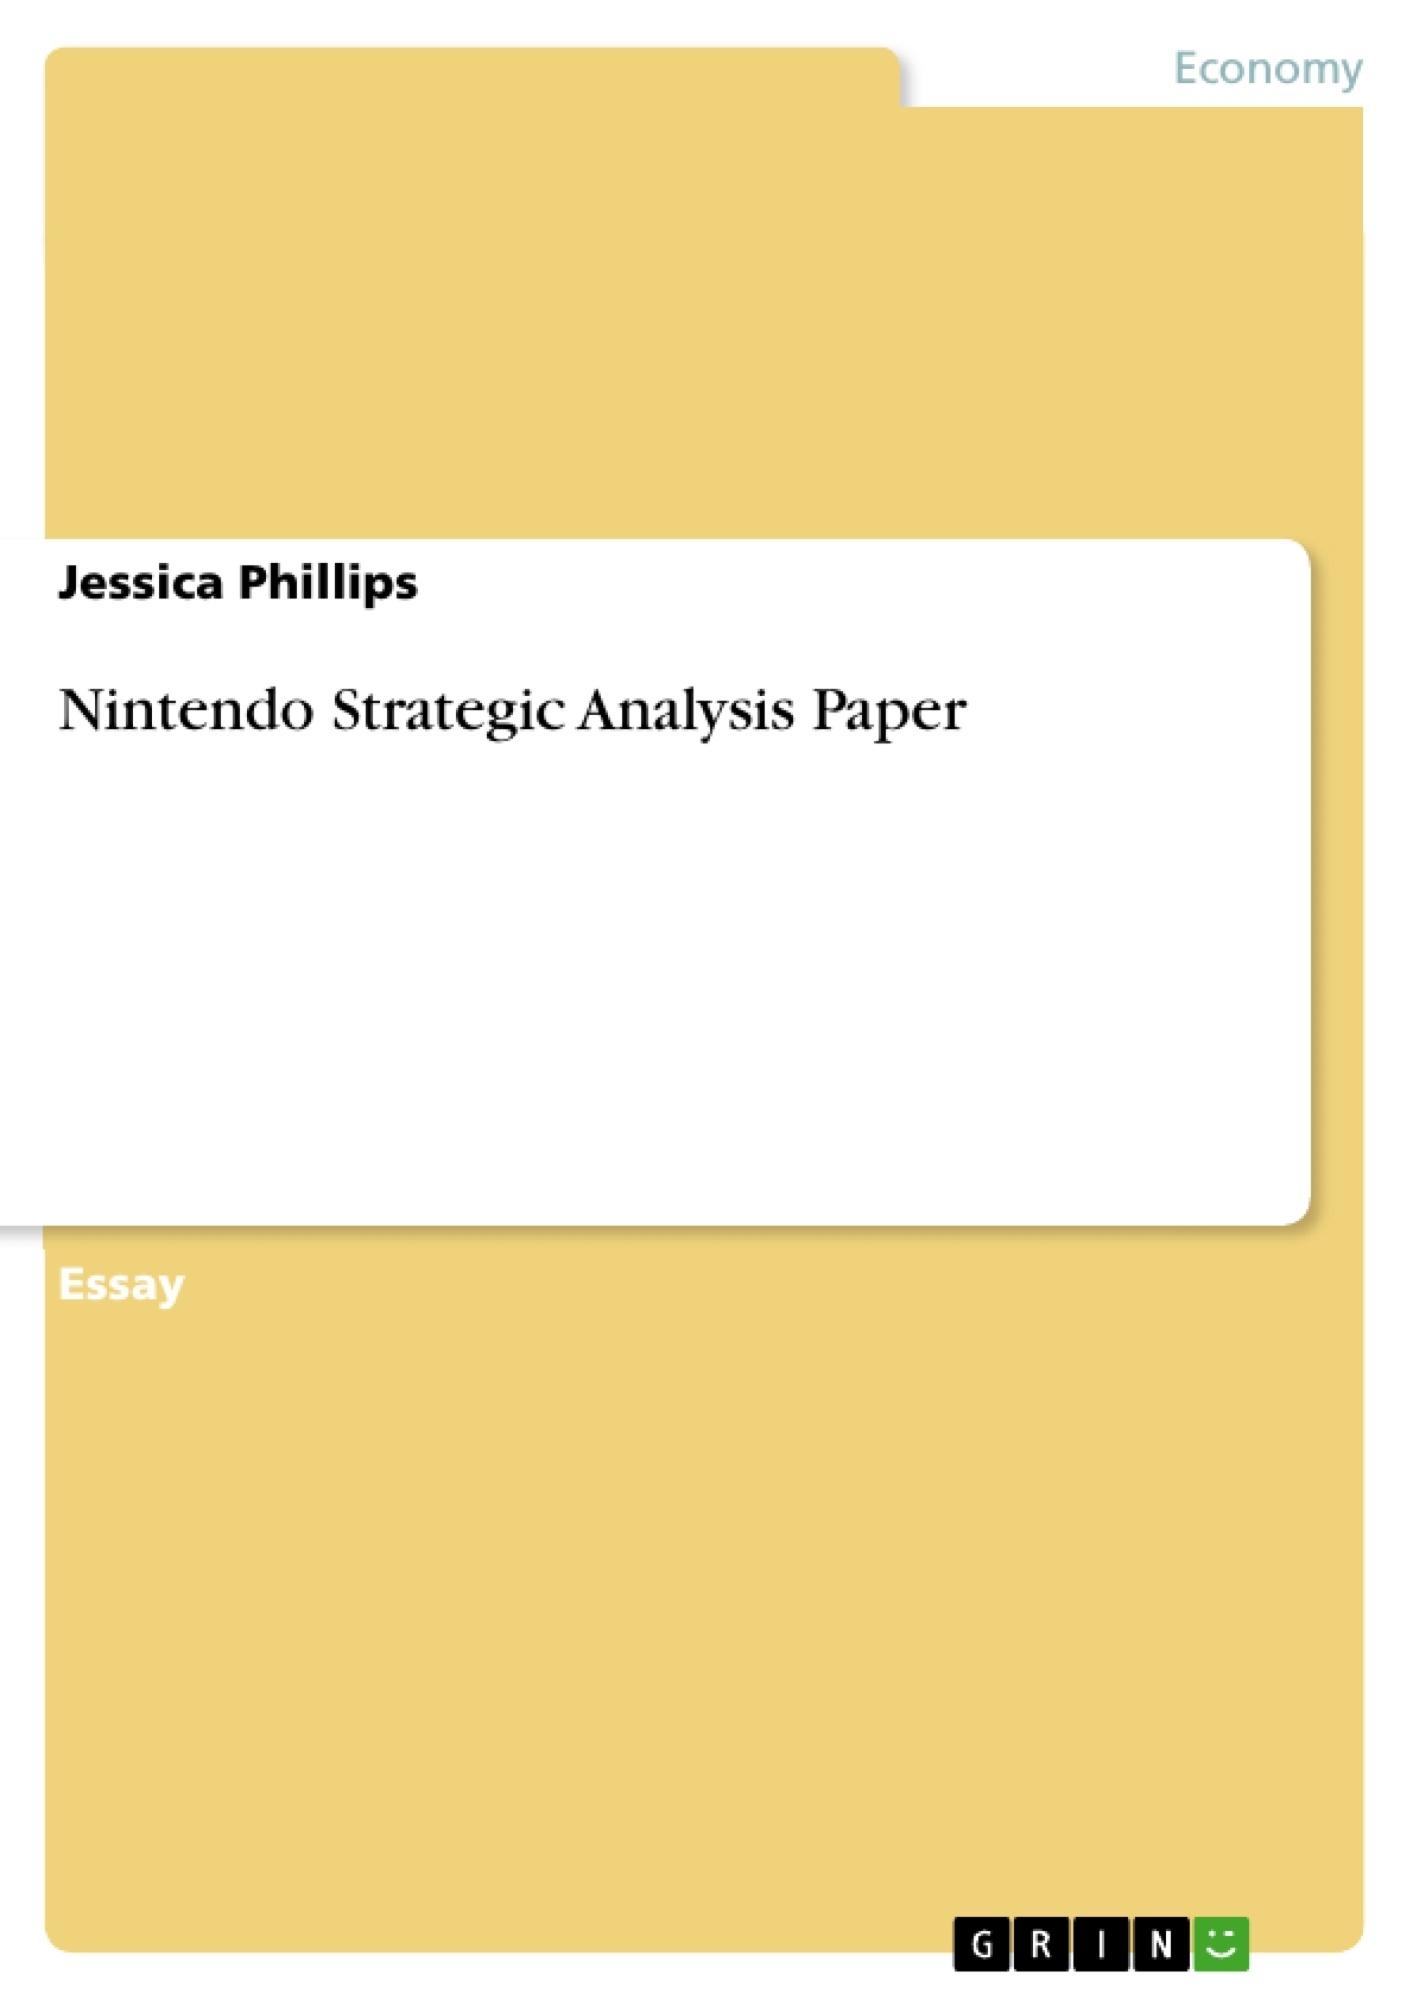 Title: Nintendo Strategic Analysis Paper